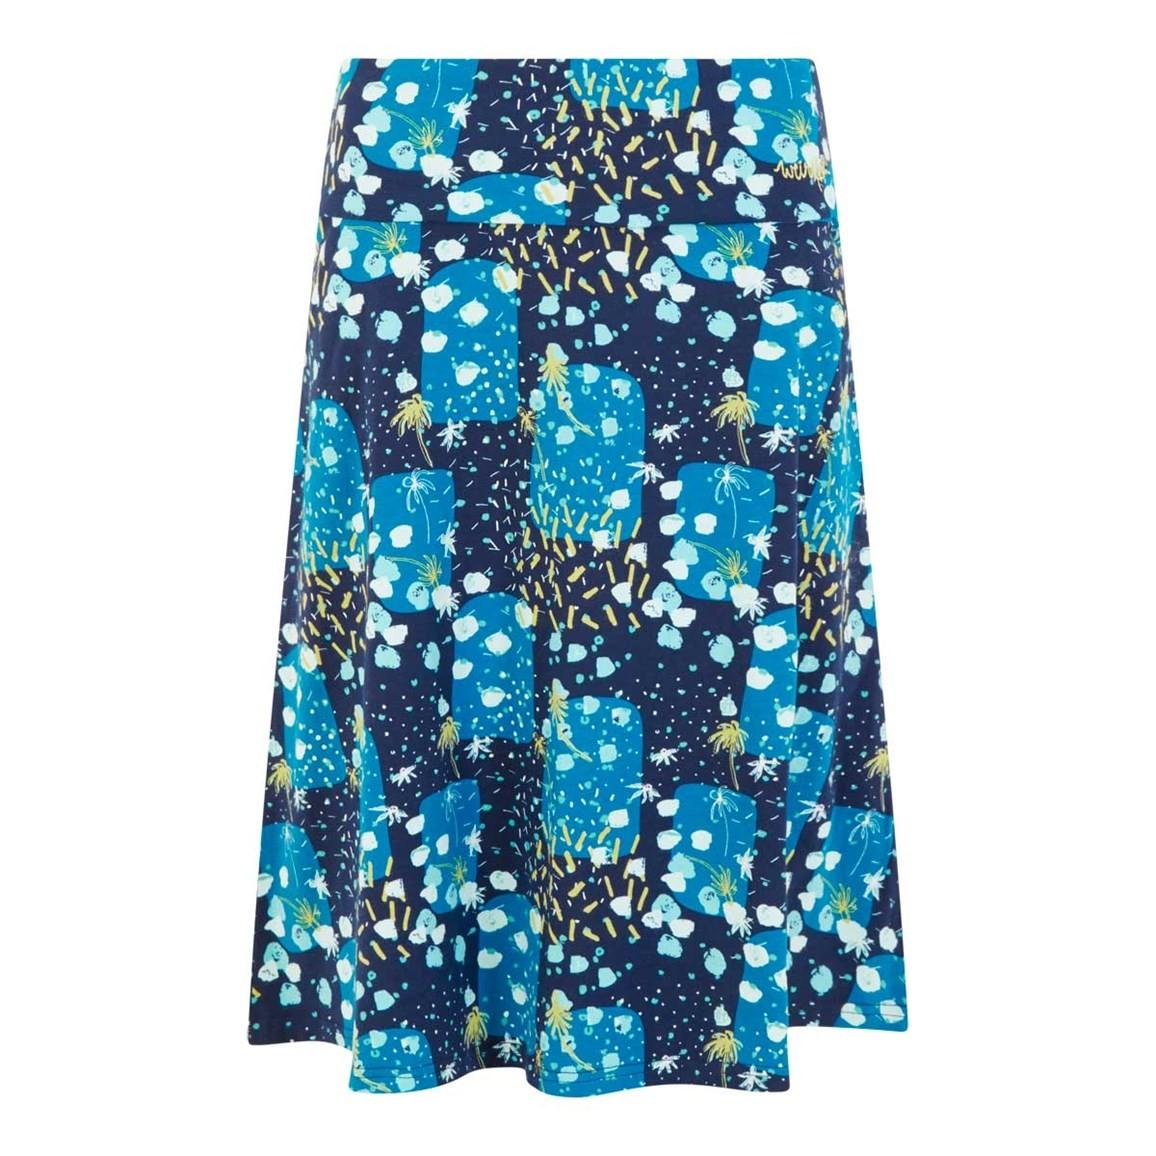 Weird Fish Malmo Printed Jersey Skirt Blue Sapphire Size 10